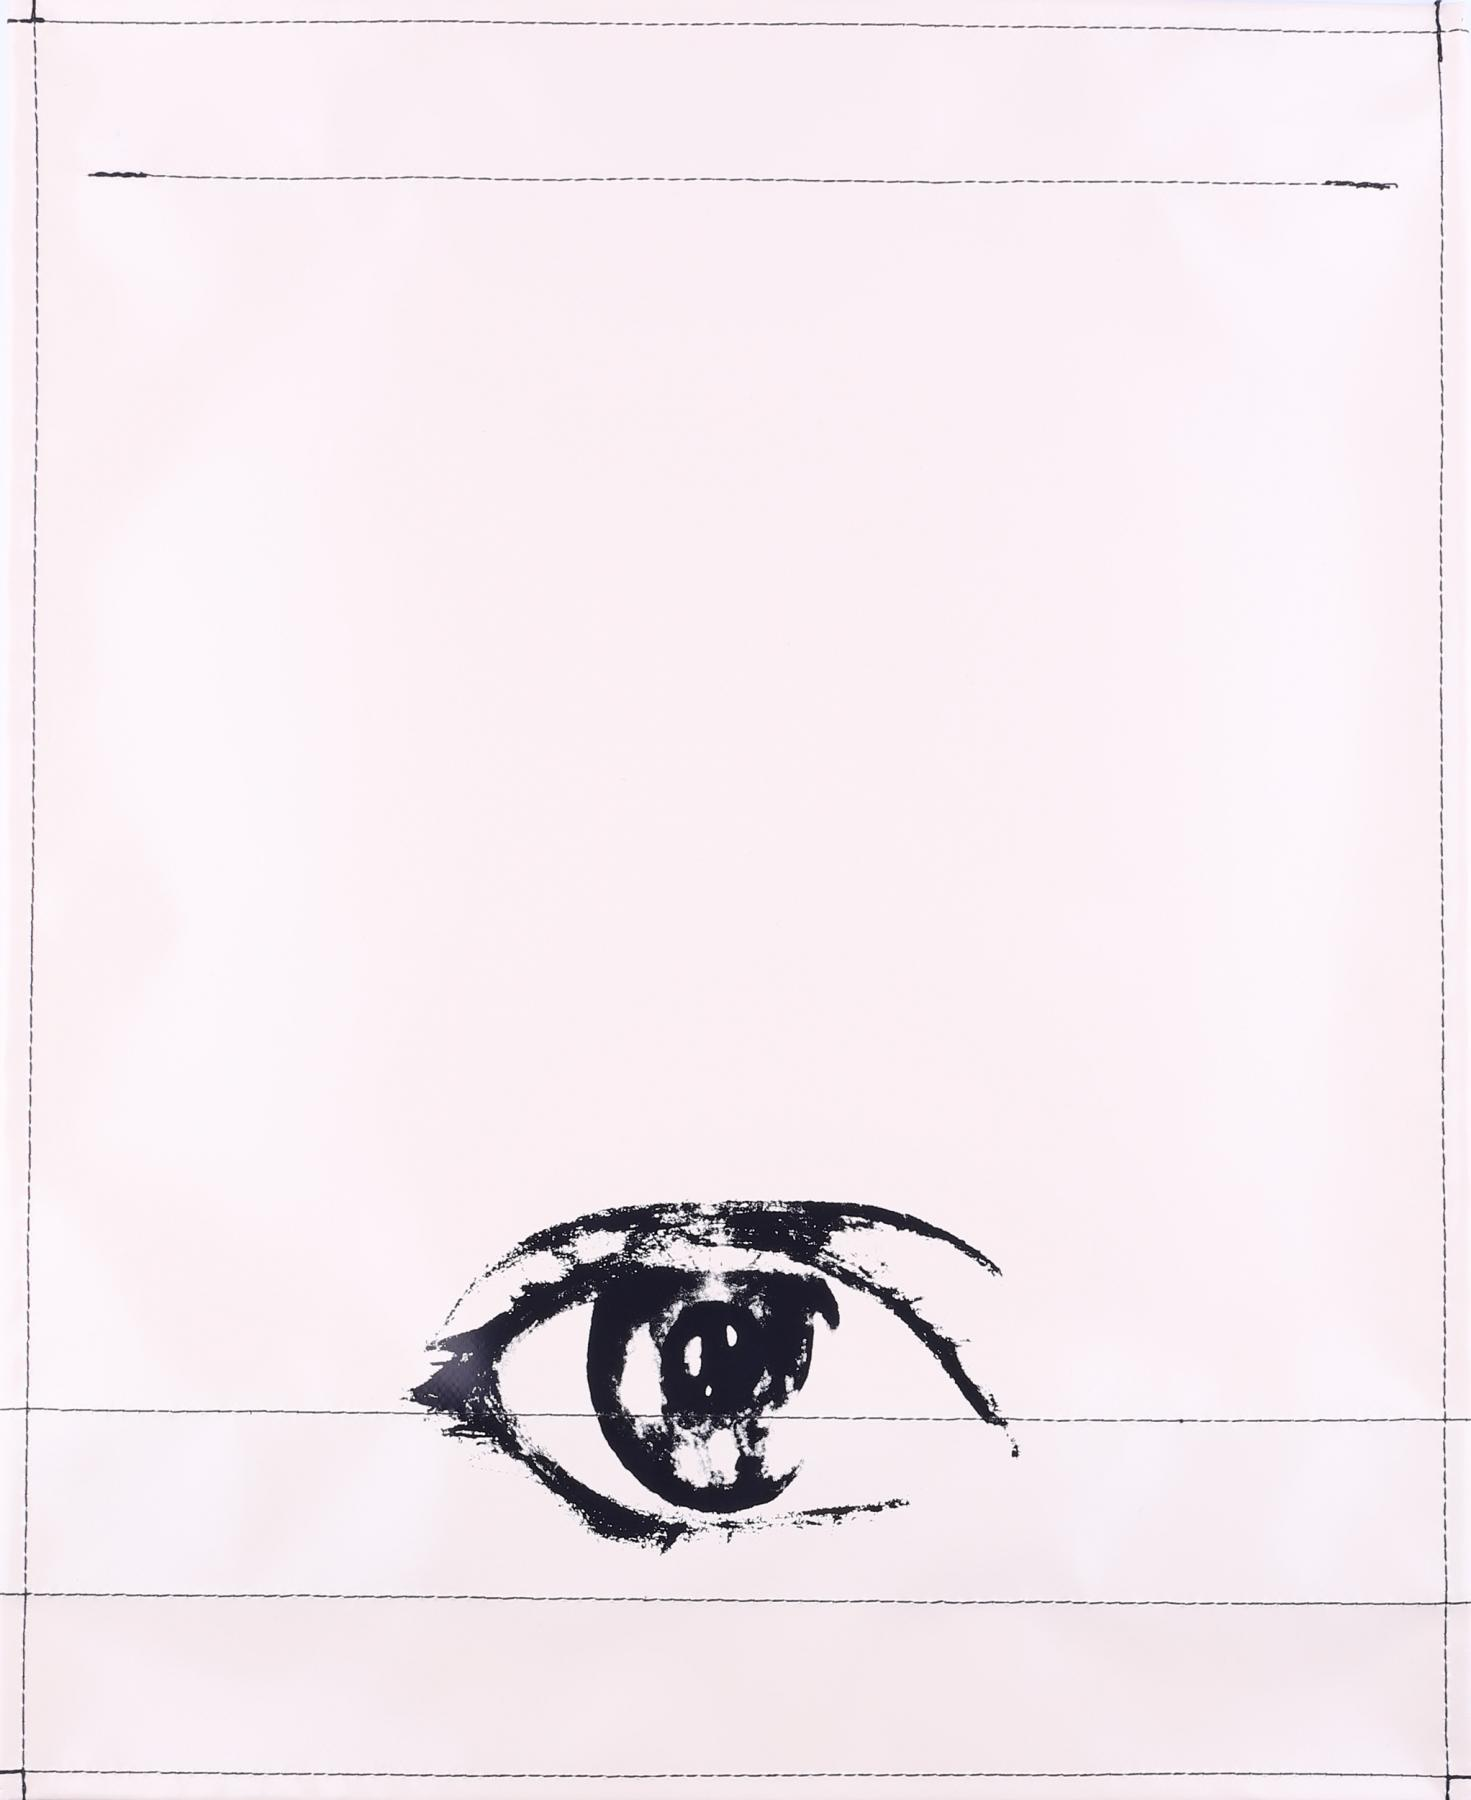 Auge Jeanne (groß)